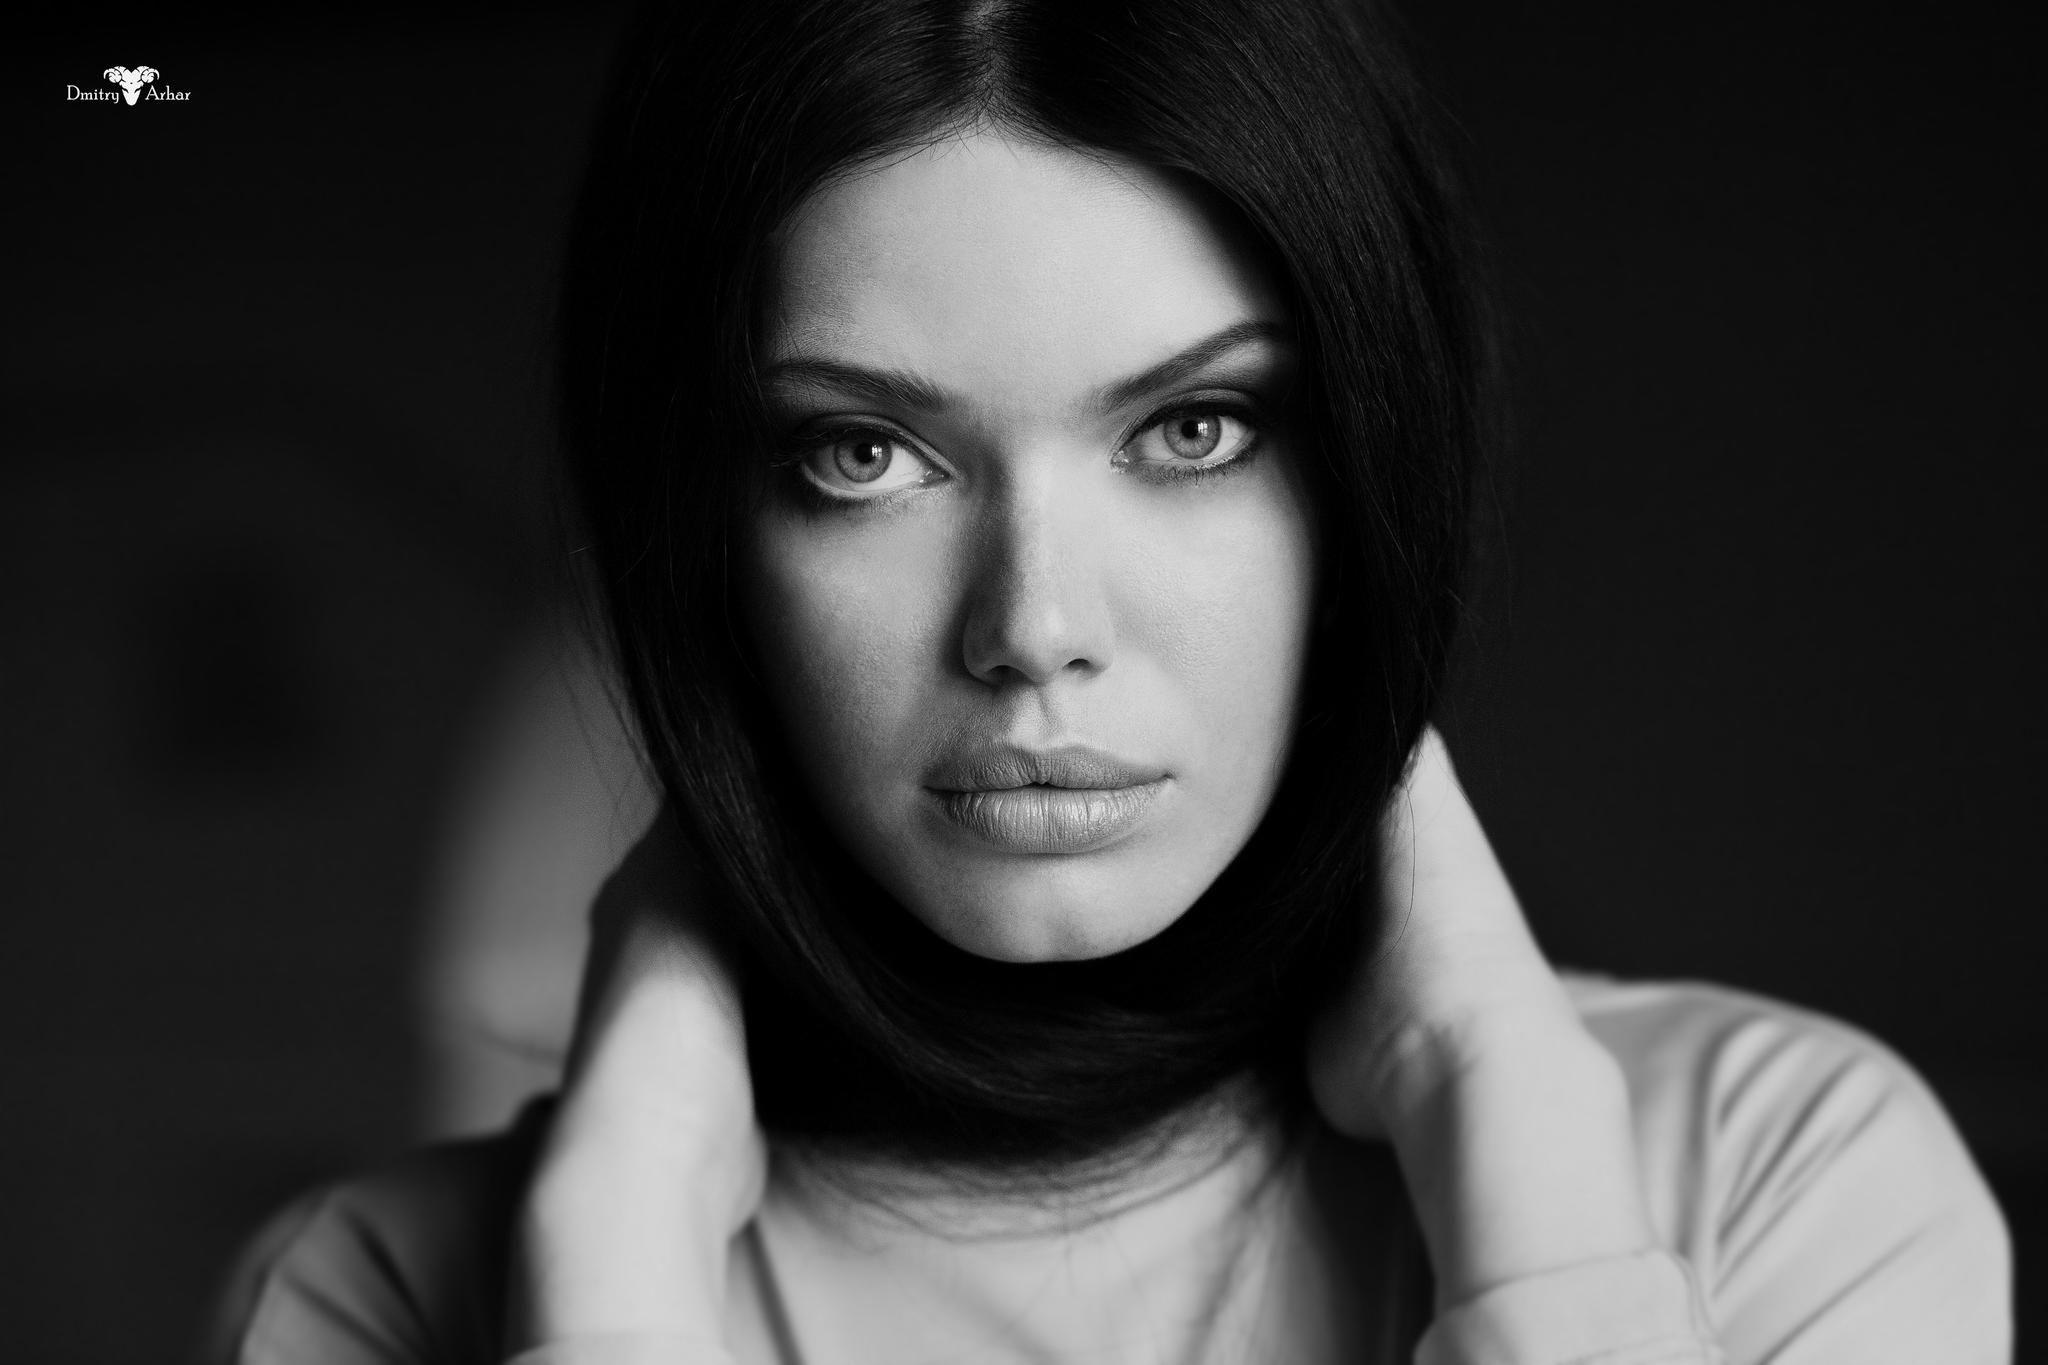 Veronica by Dmitry Arhar on 500px